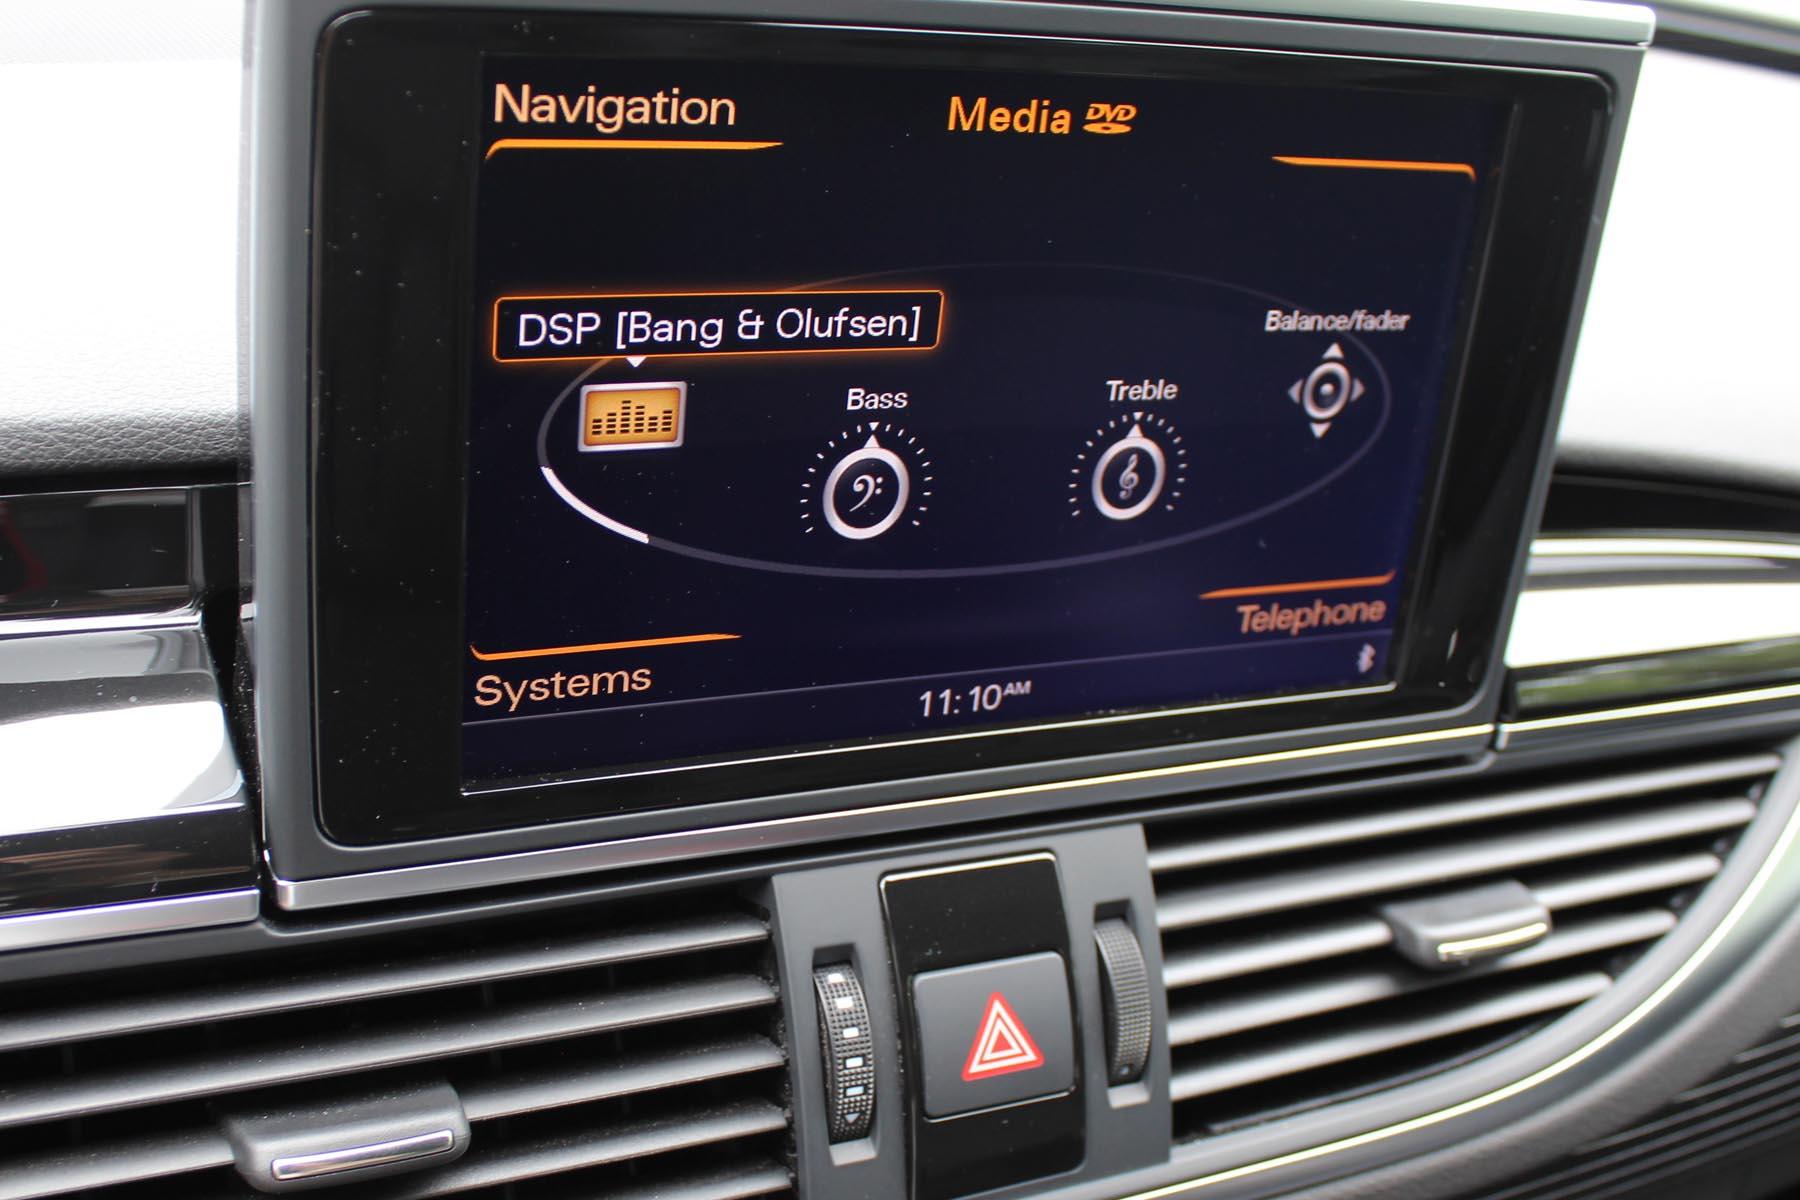 2014 Audi RS7 Bang & Olufsen audio